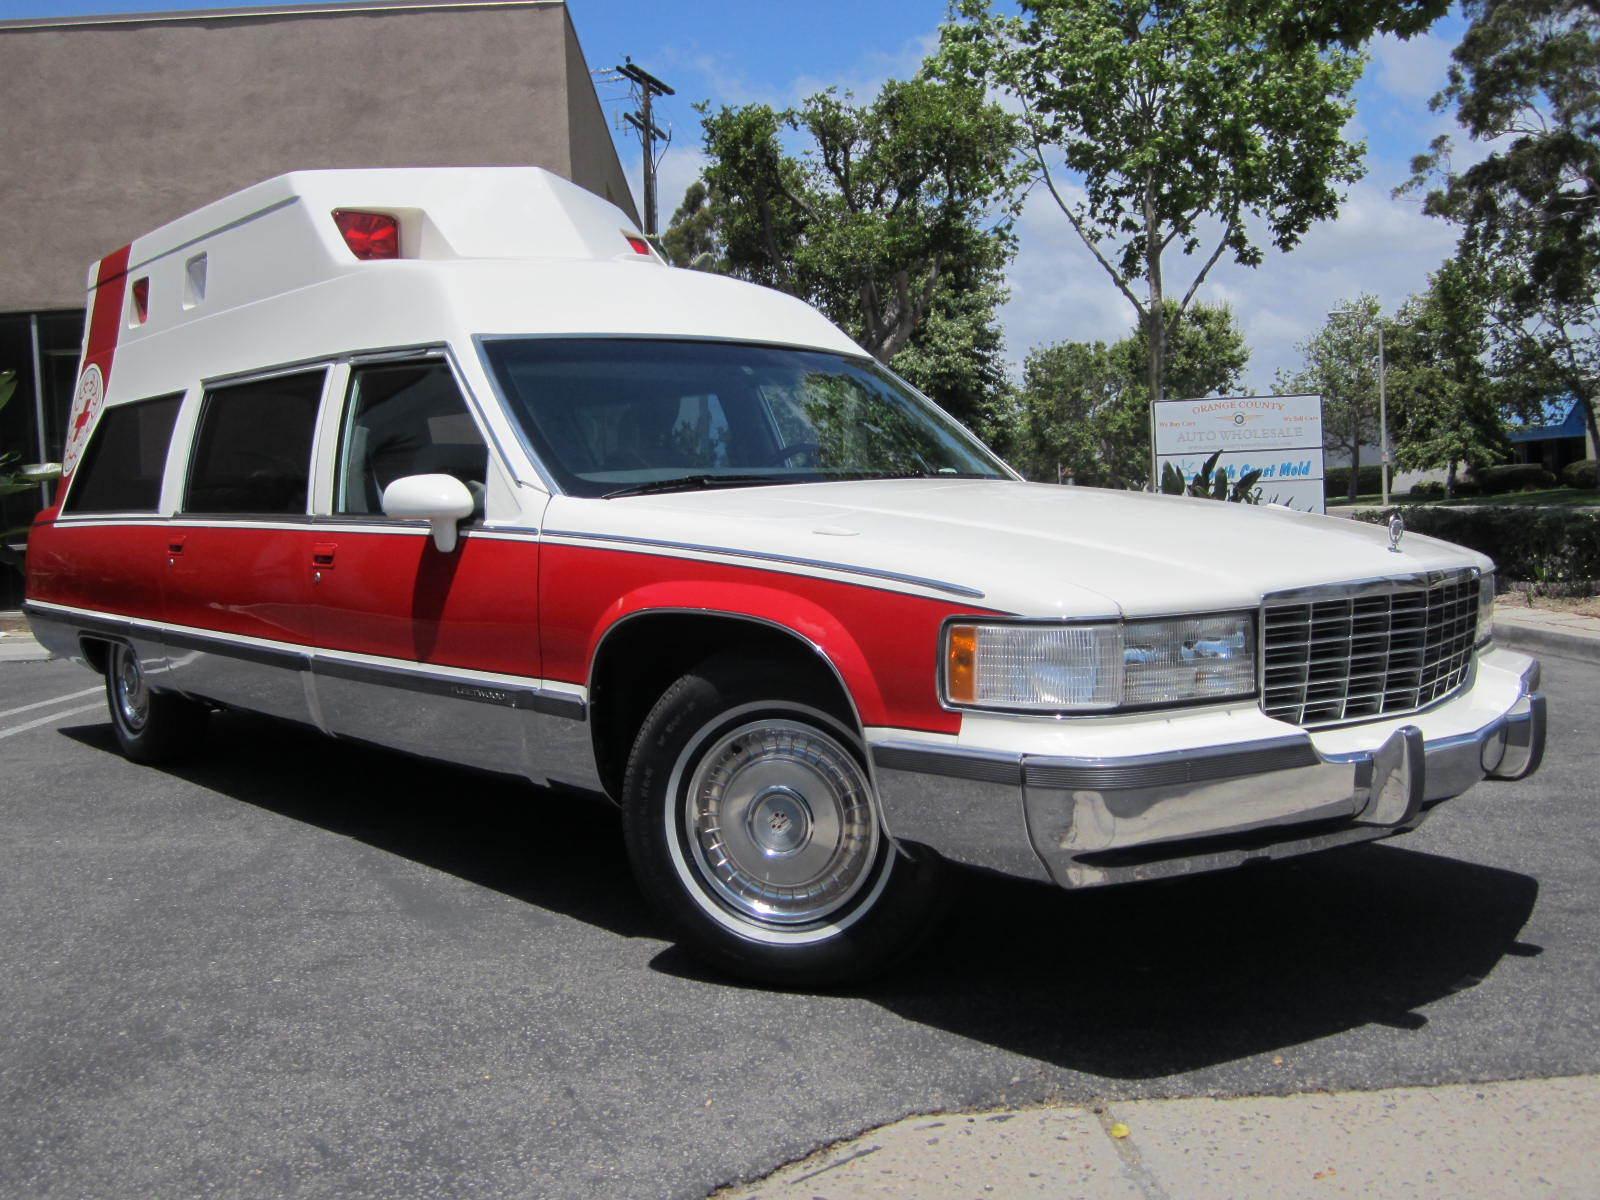 pristine shape 1993 cadillac fleetwood ambulance hearse for sale